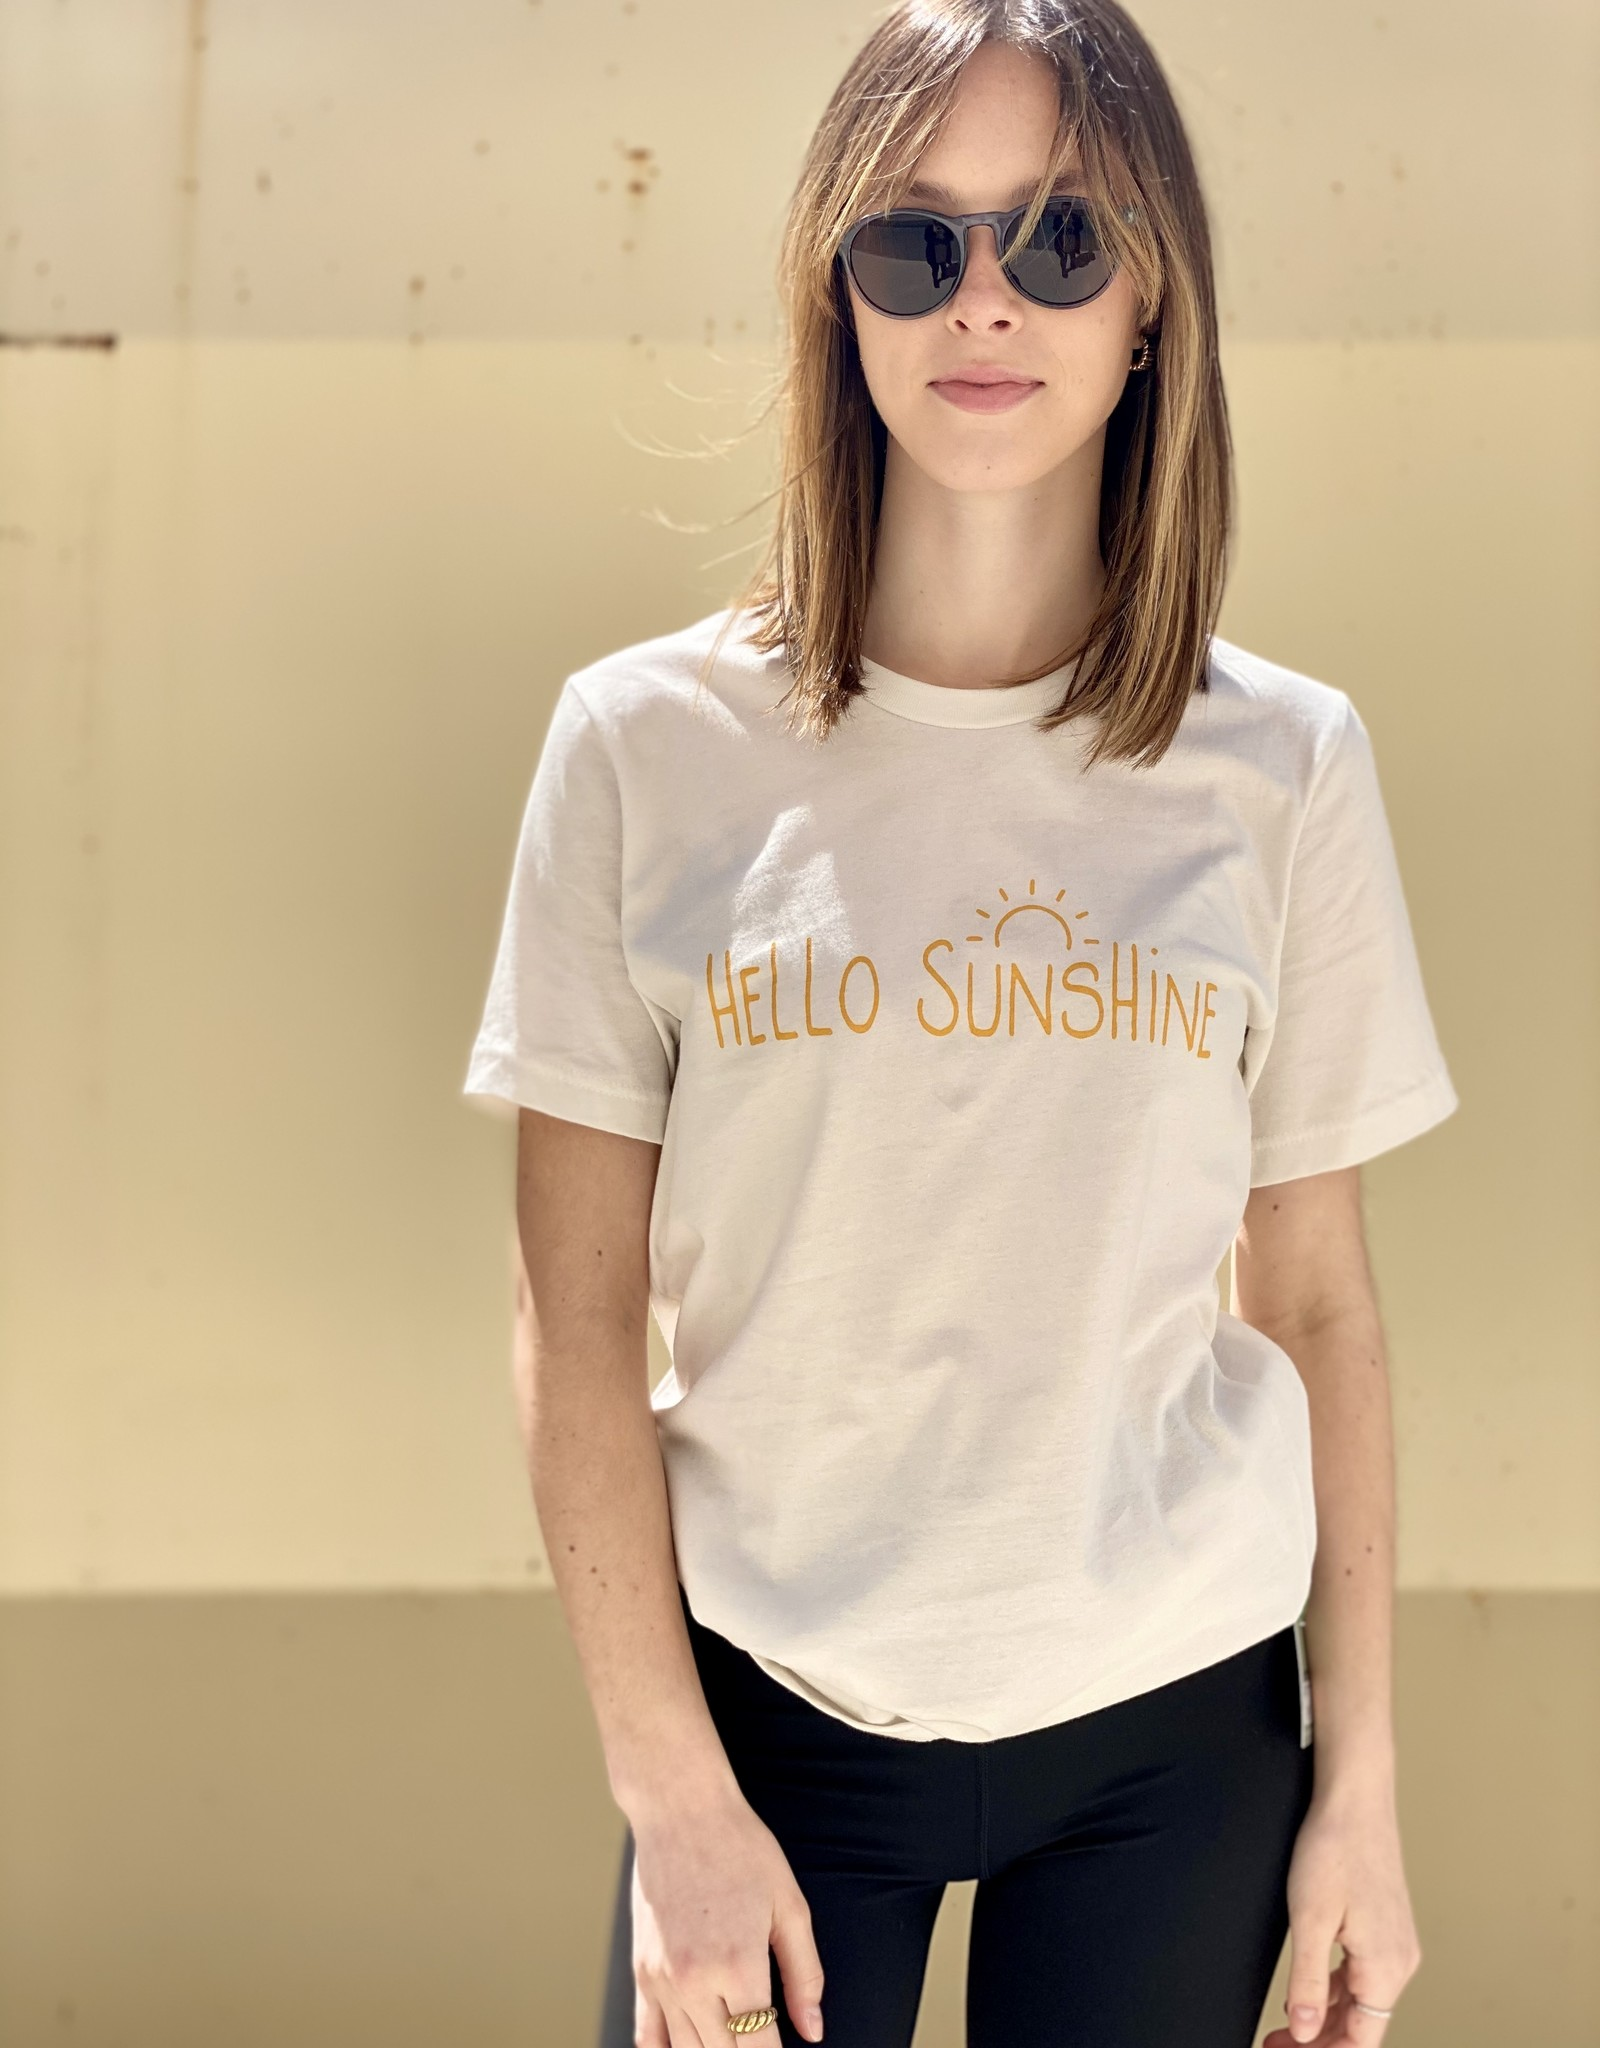 HUSH Hello sunshine graphic tee